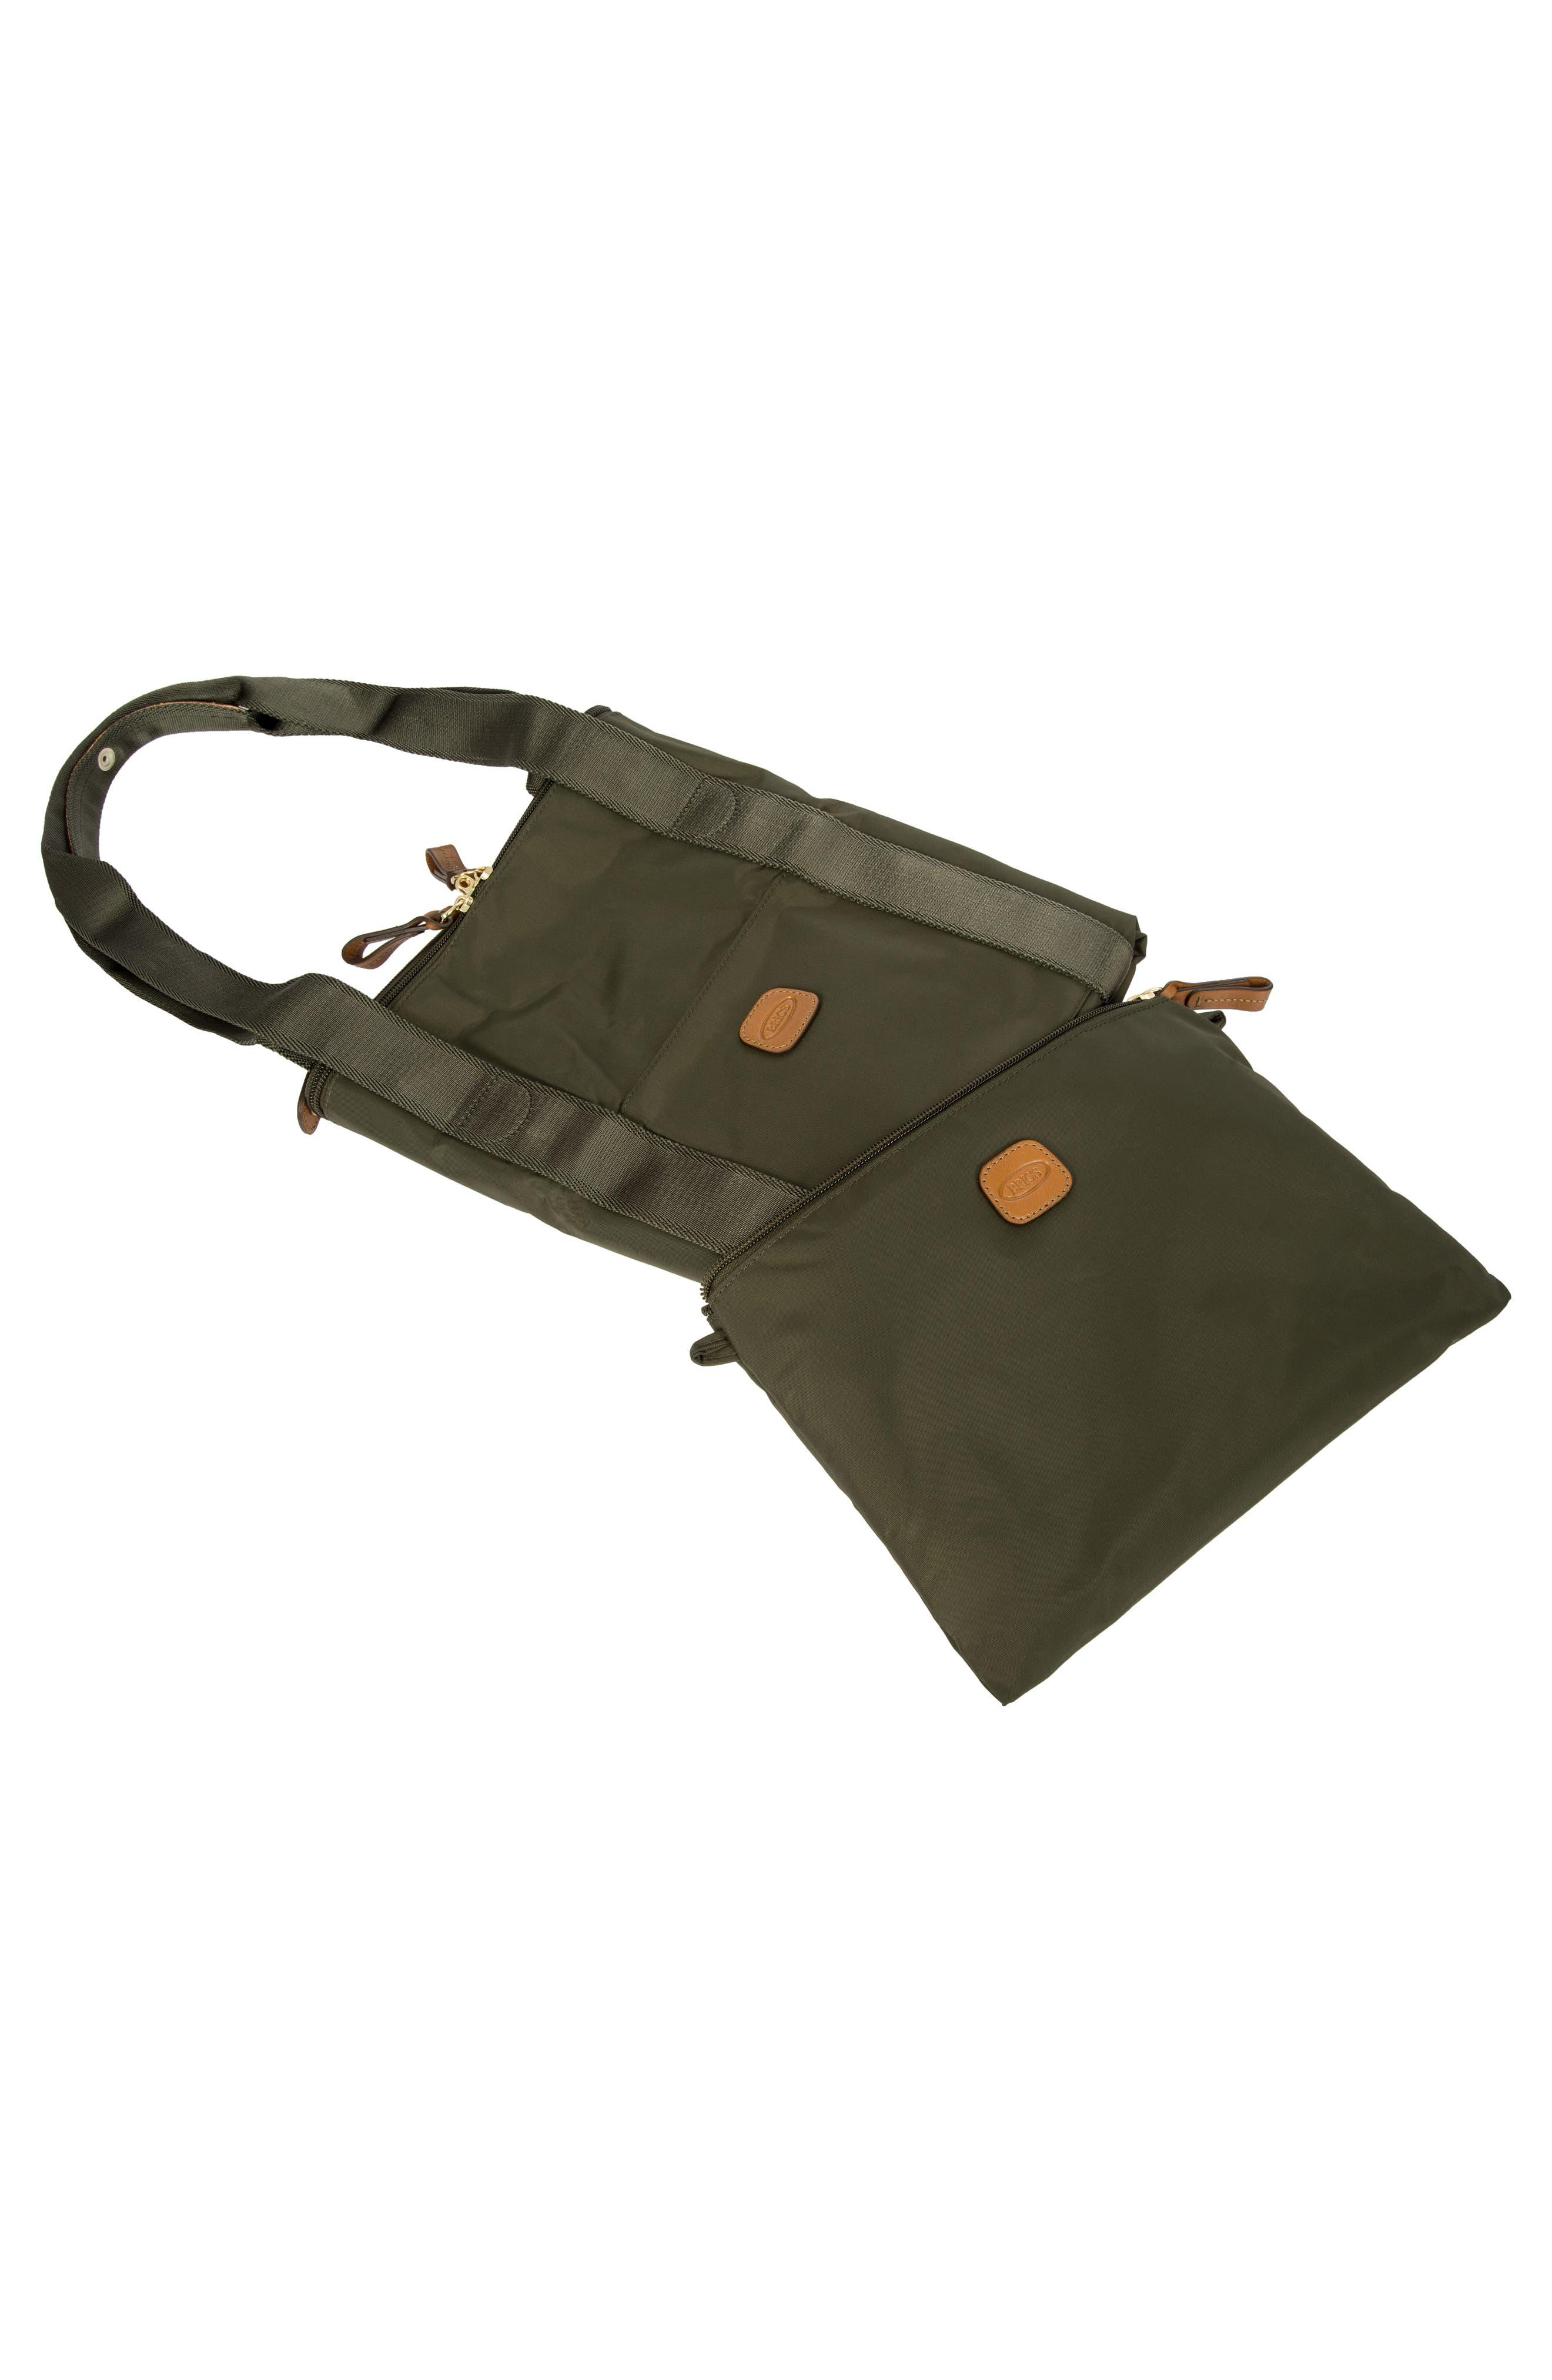 X-Bag 22-Inch Folding Duffel Bag,                             Alternate thumbnail 7, color,                             OLIVE